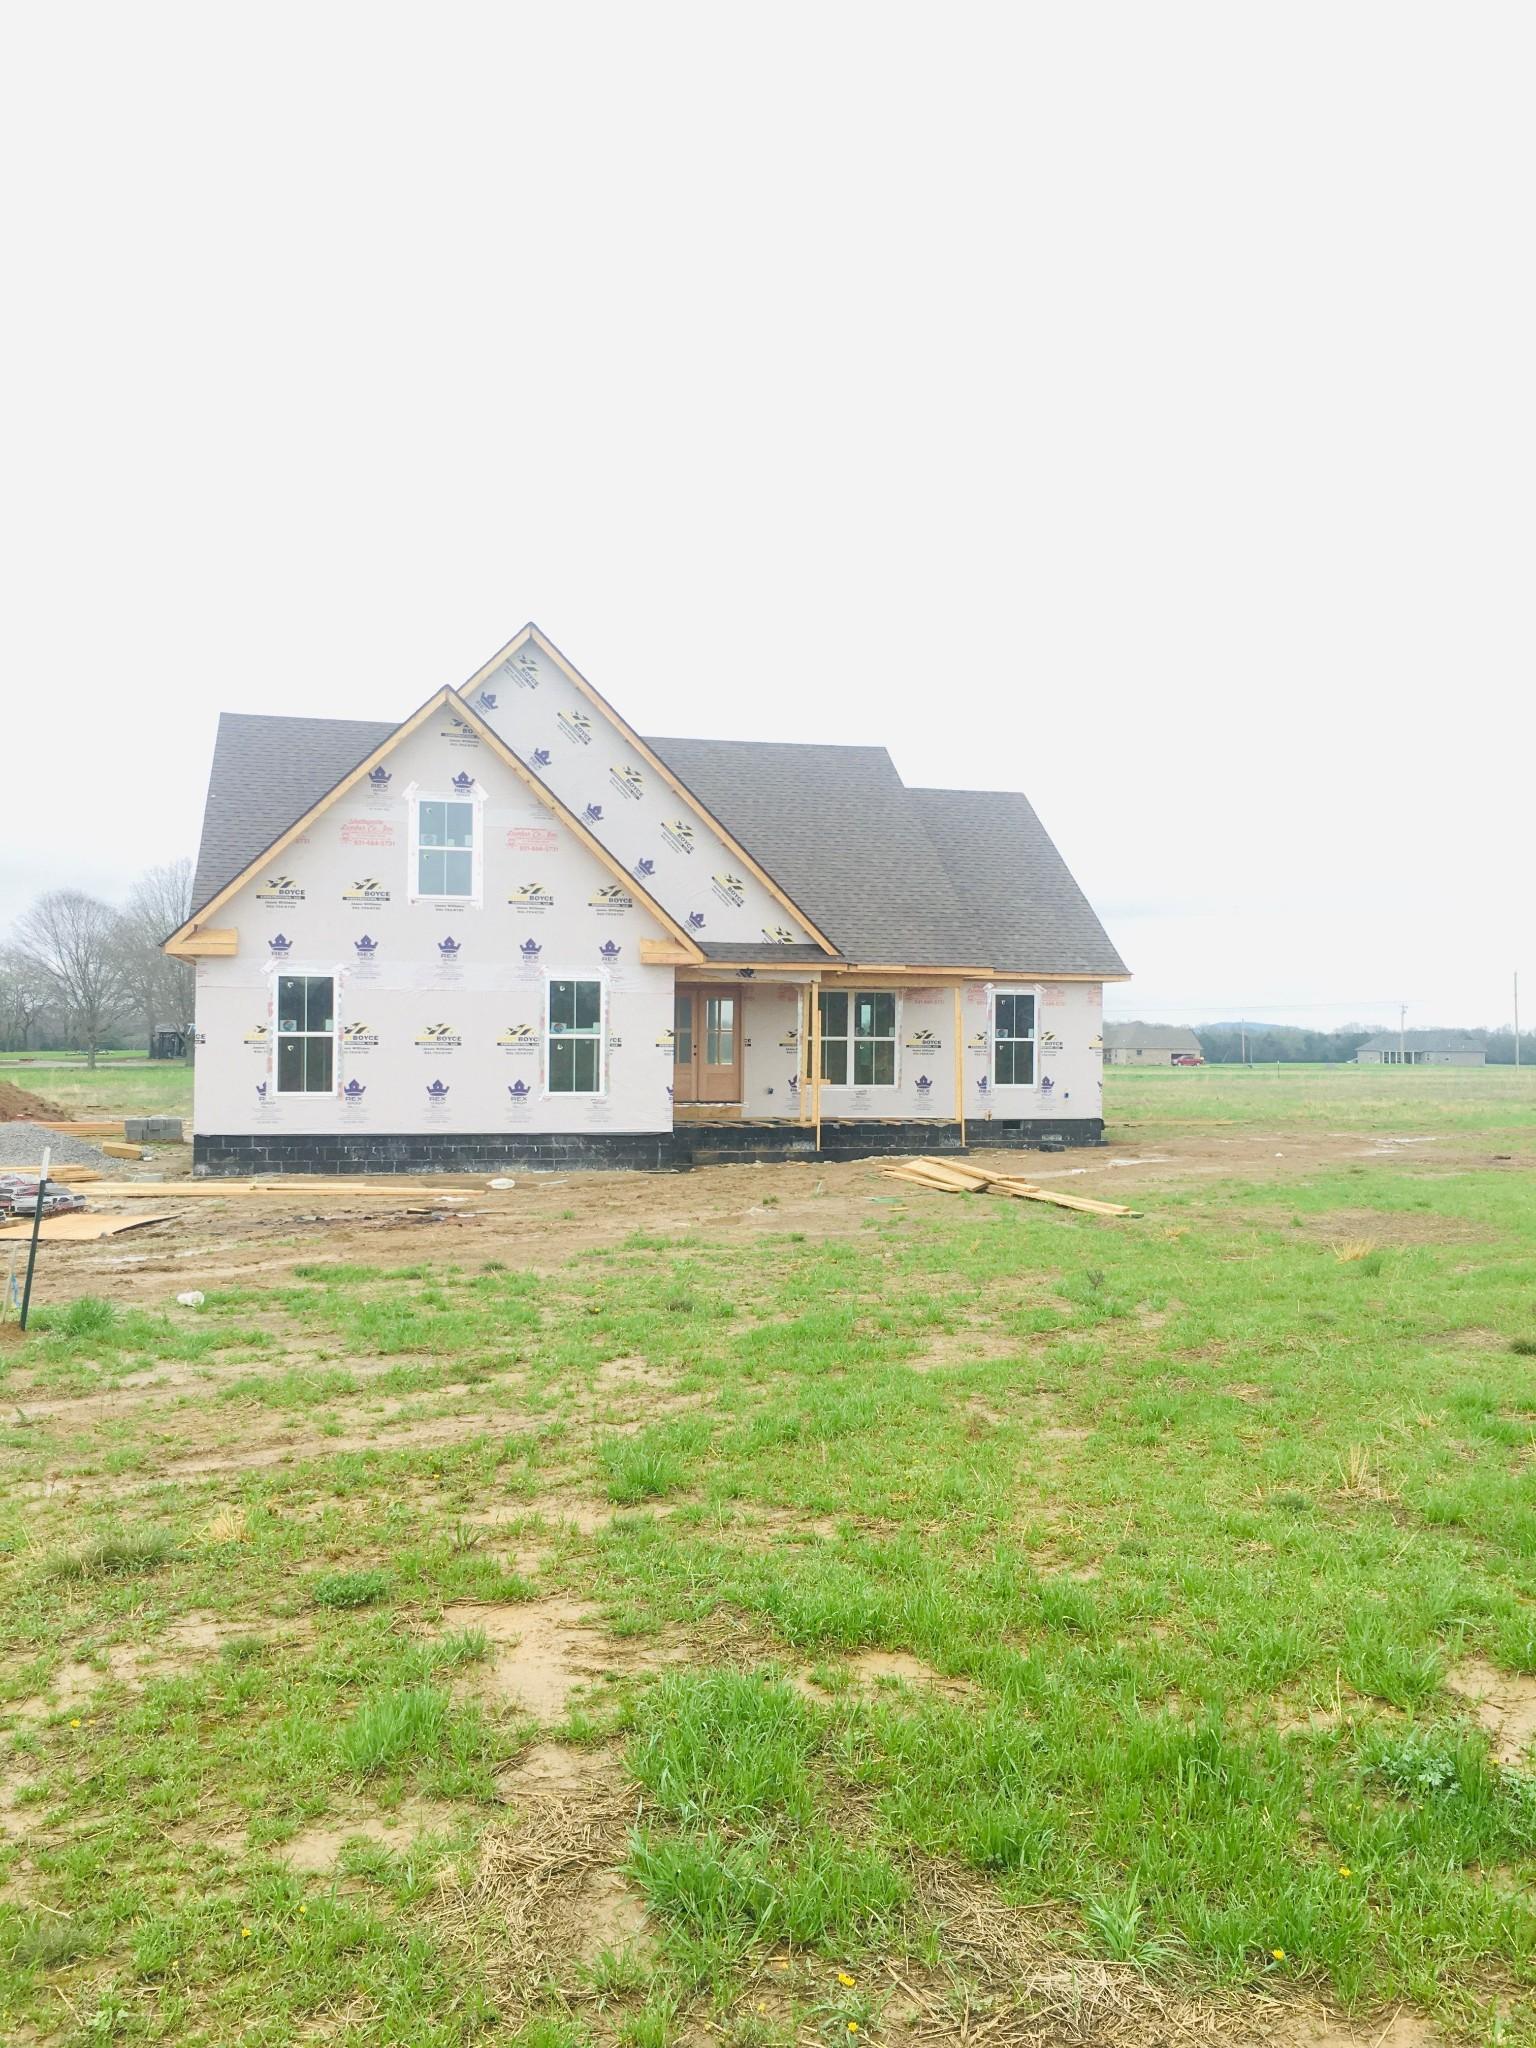 2020 Longview RD, Bell Buckle, TN 37020 - Bell Buckle, TN real estate listing